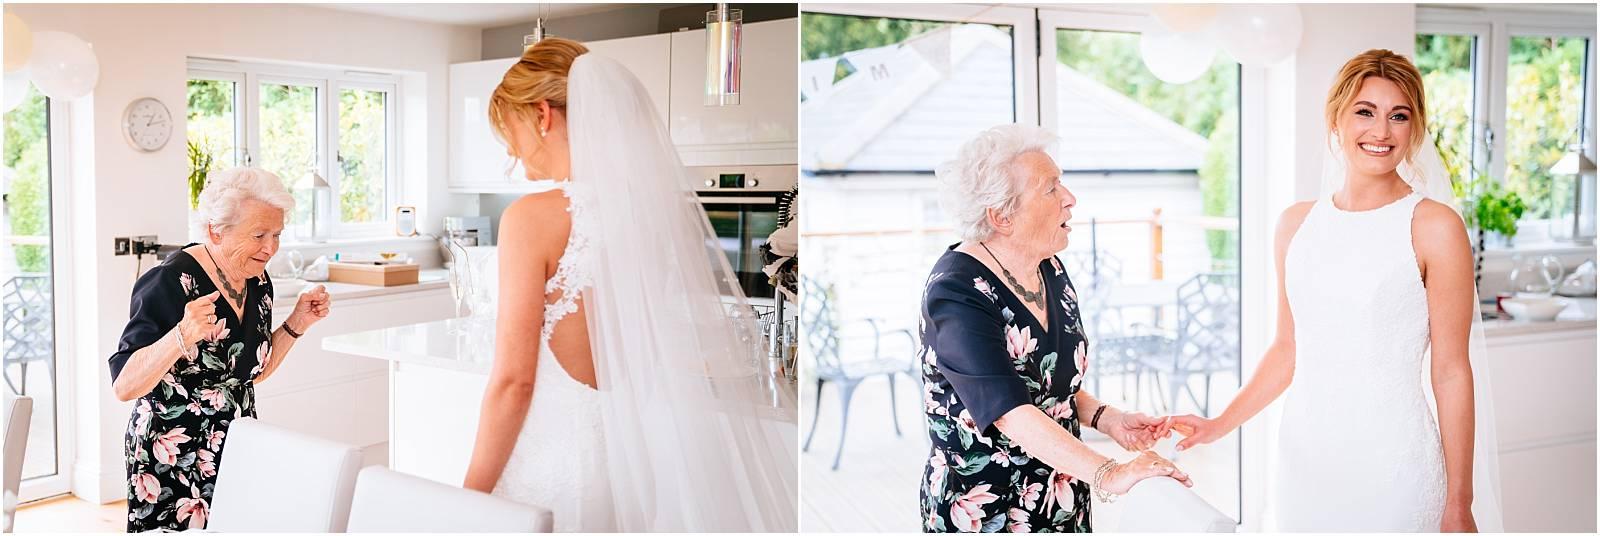 grandma wowed by bride